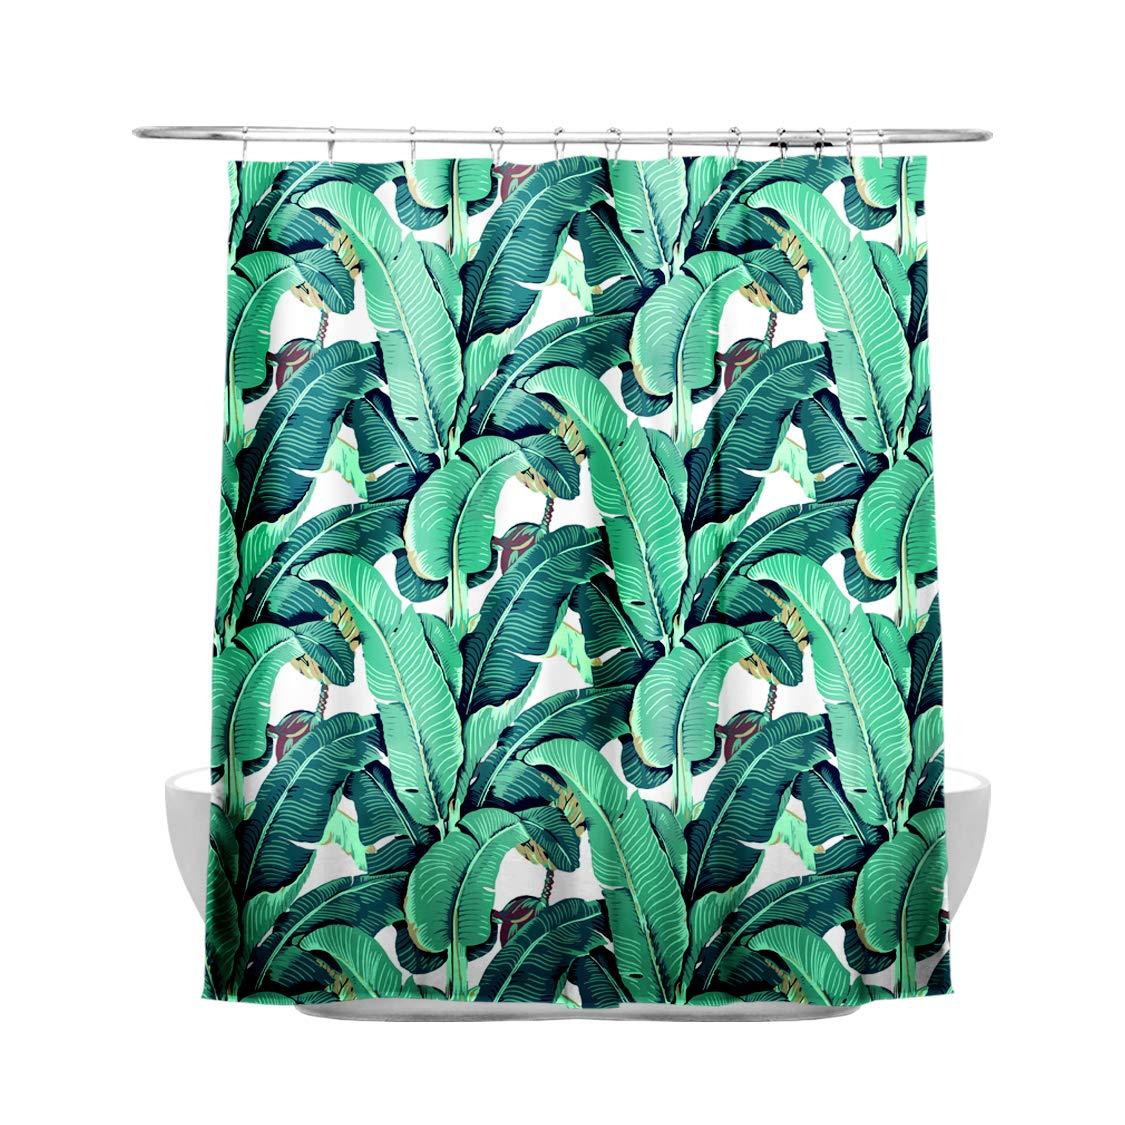 Creative & Smart Shower Curtain – 100% High-Grade Polyester Material, Amazing Exotic Rainforest Banana Leaf Pattern, Waterproof & Heavy-Duty Design, Bathroom Curtain Hooks Included, 180cm X 180cm Charlesshunshun